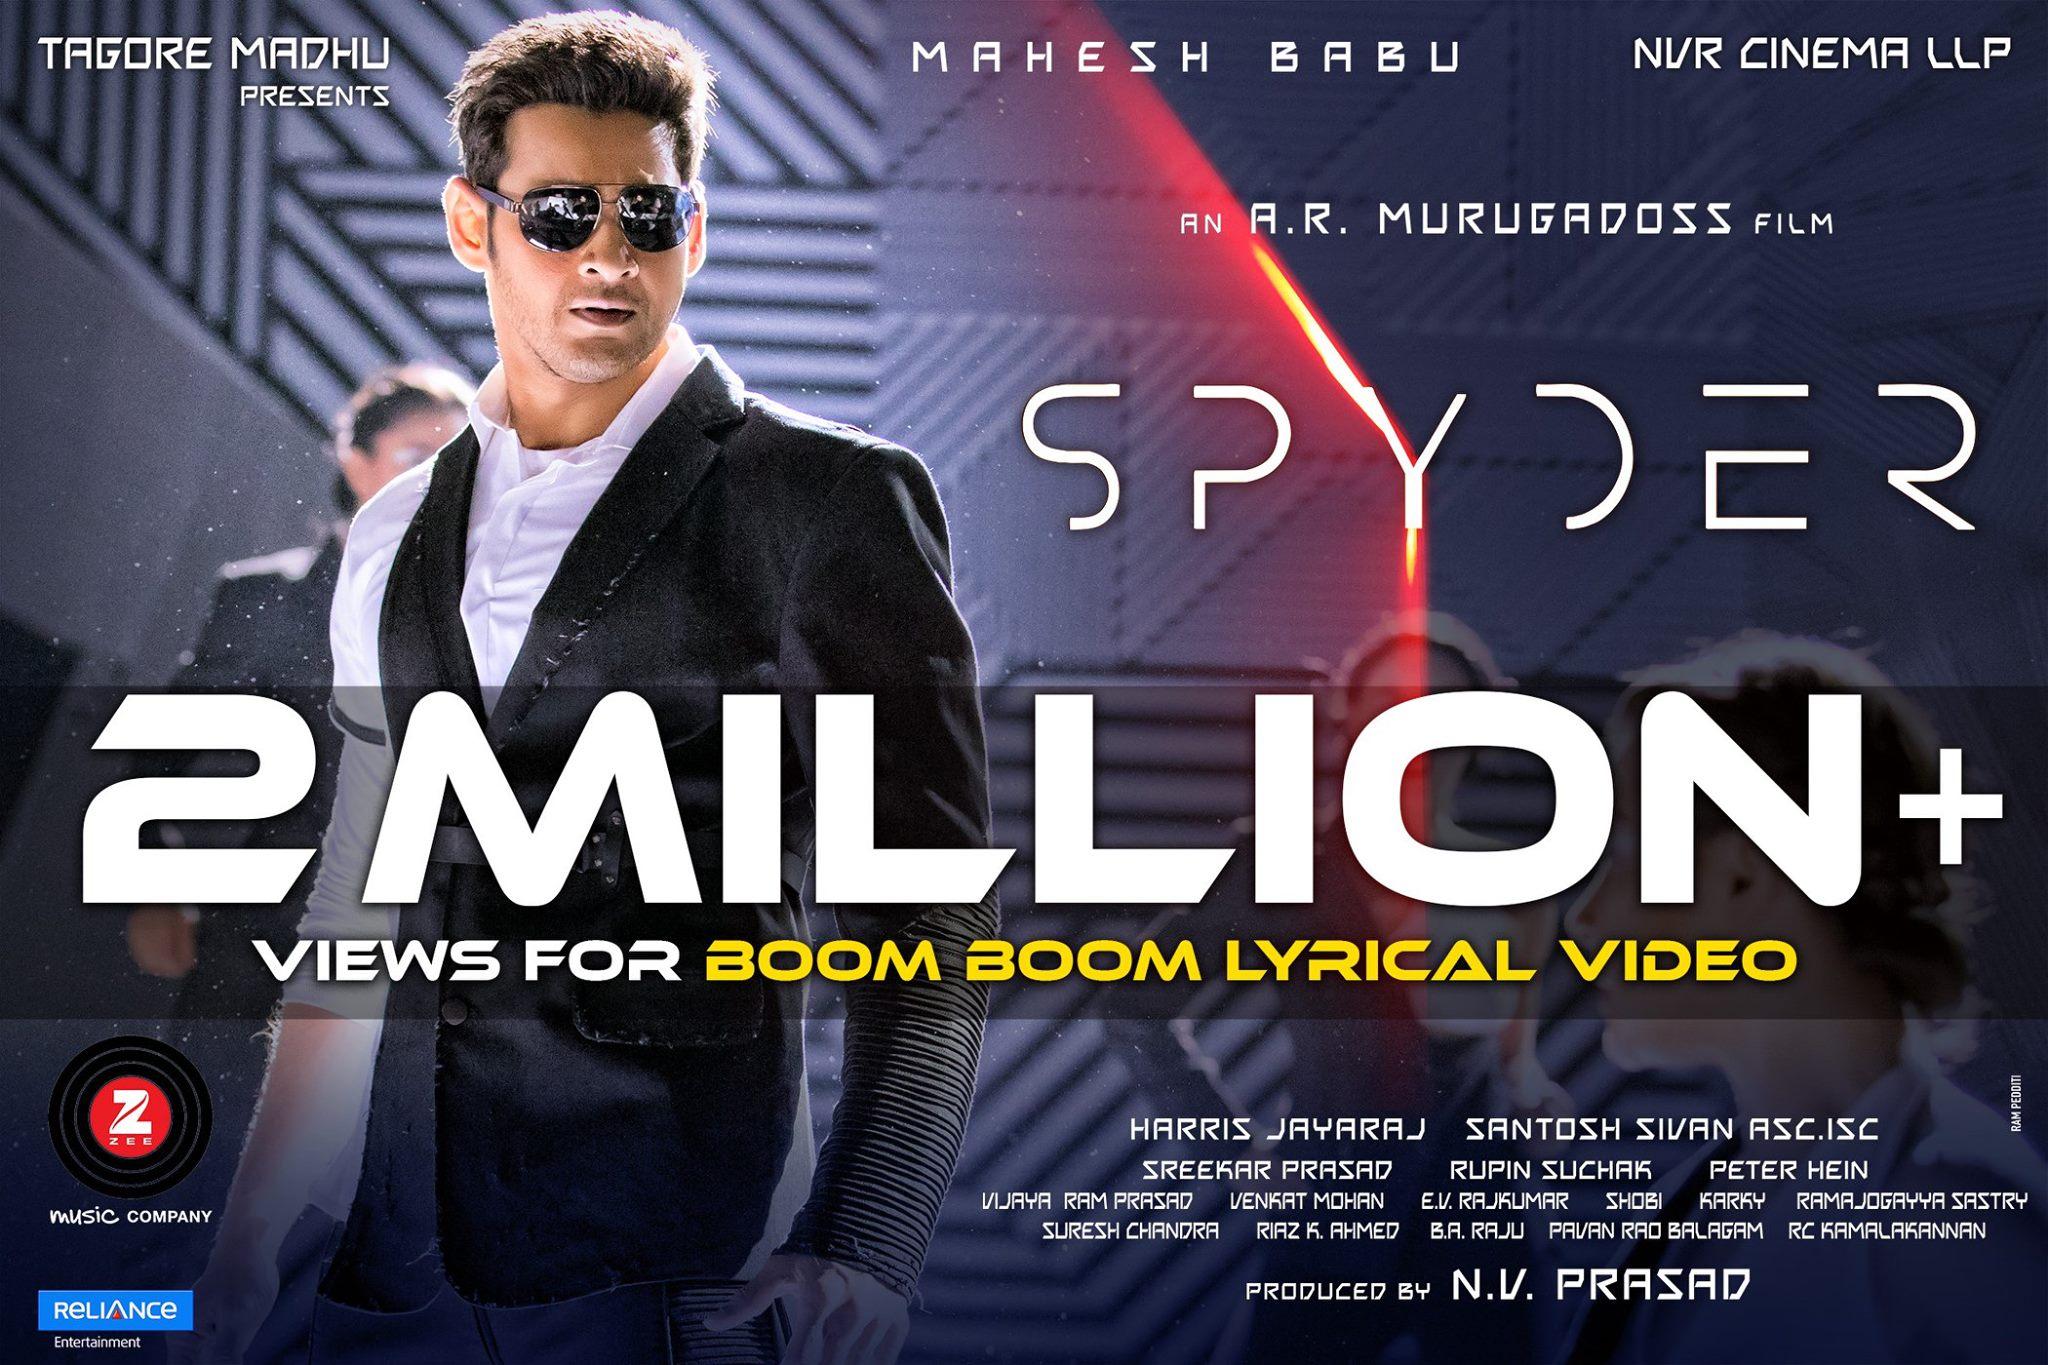 Jr Ntr Nannaku Prematho Movie First Look Ultra Hd Posters: Mahesh Babu SPYDER Movie First Look ULTRA HD Posters